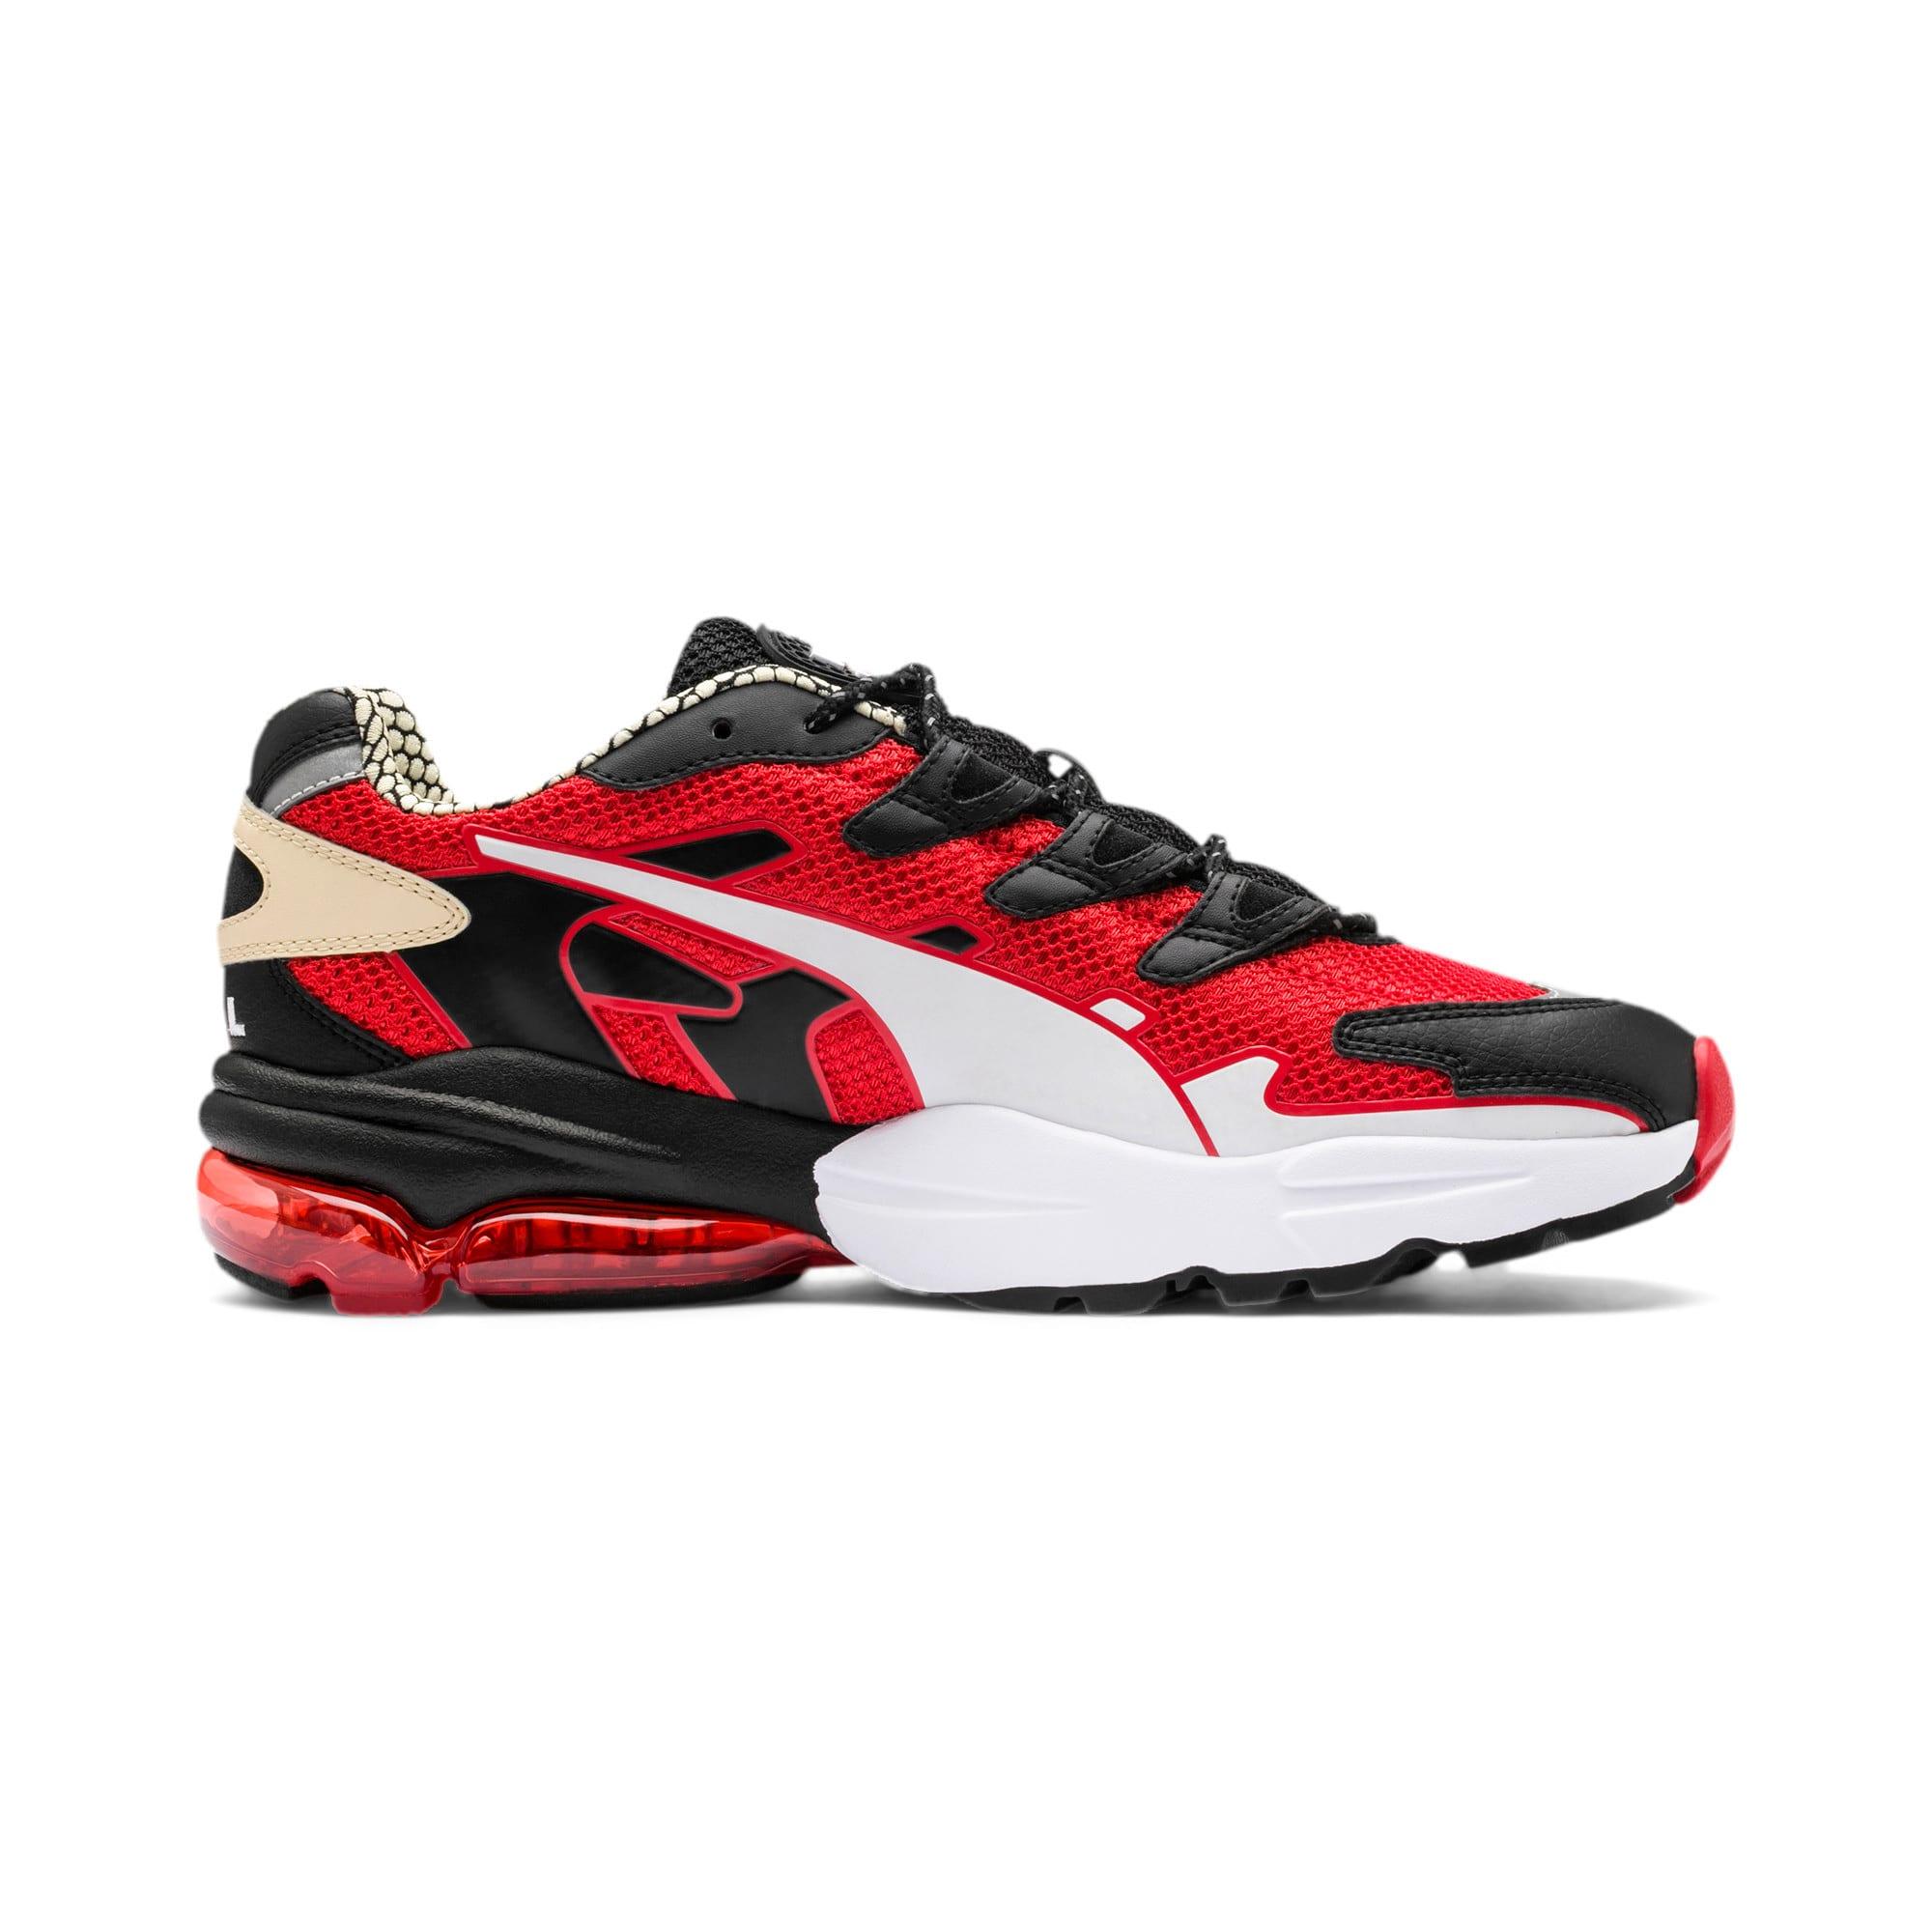 Thumbnail 6 of CELL Alien Kotto Sneakers, High Risk Red-Puma Black, medium